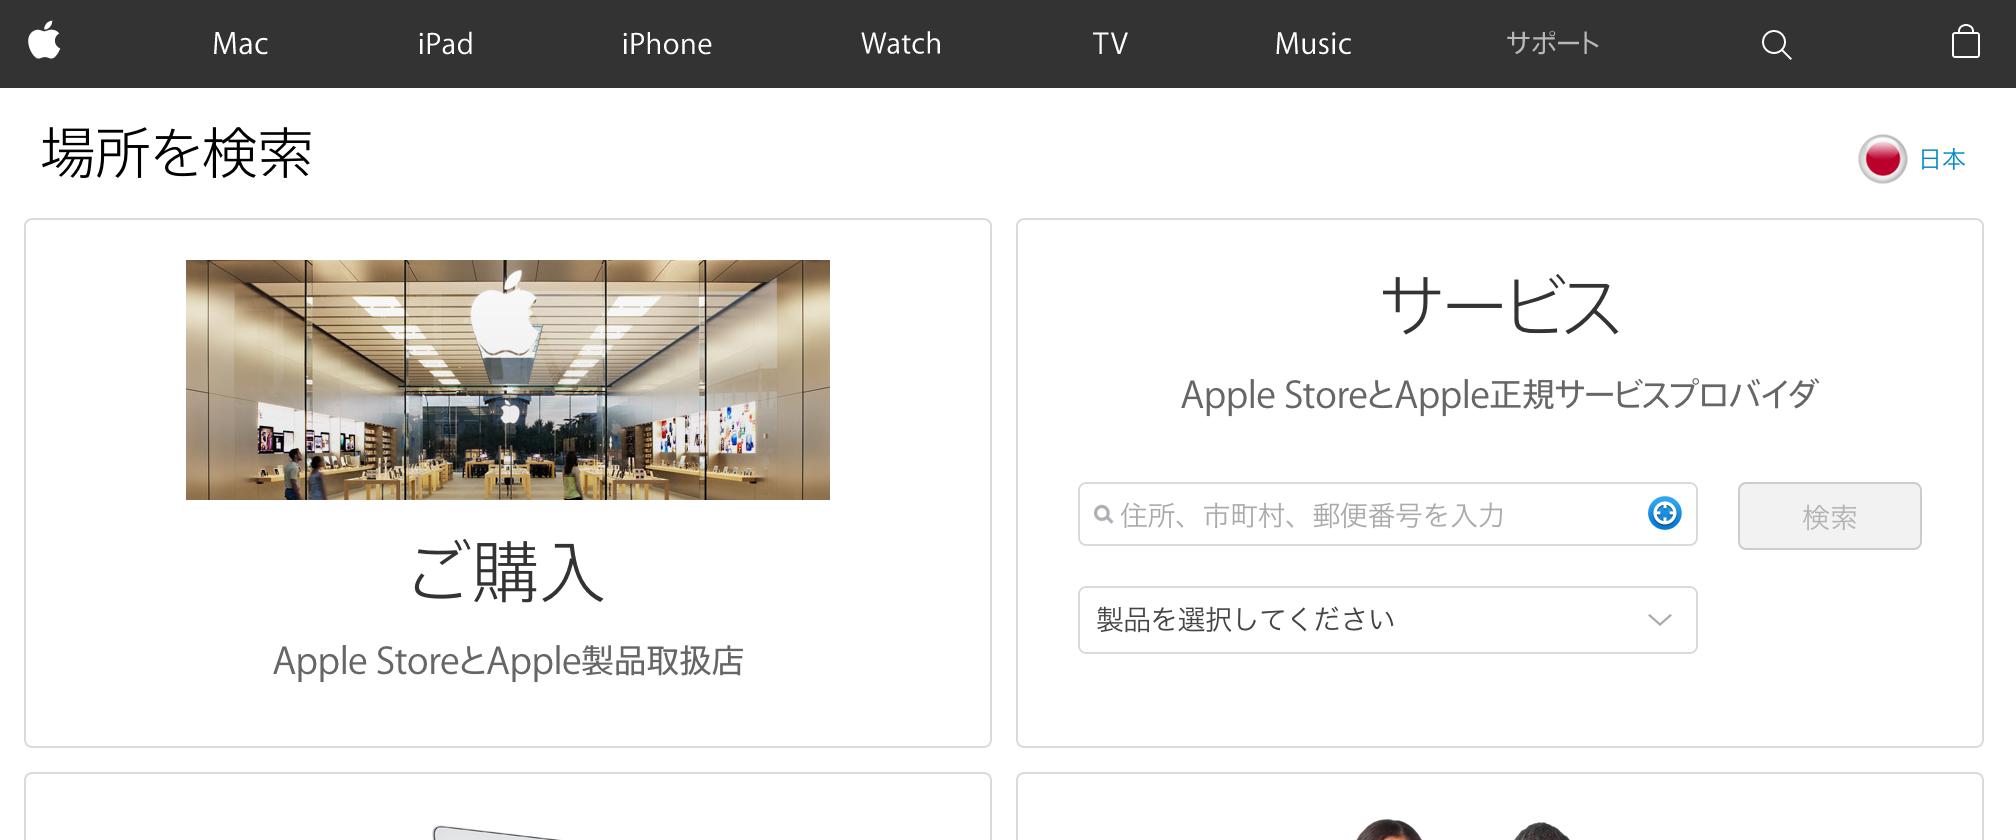 Apple Store、もしくはApple正規サービスプロバイダを探す